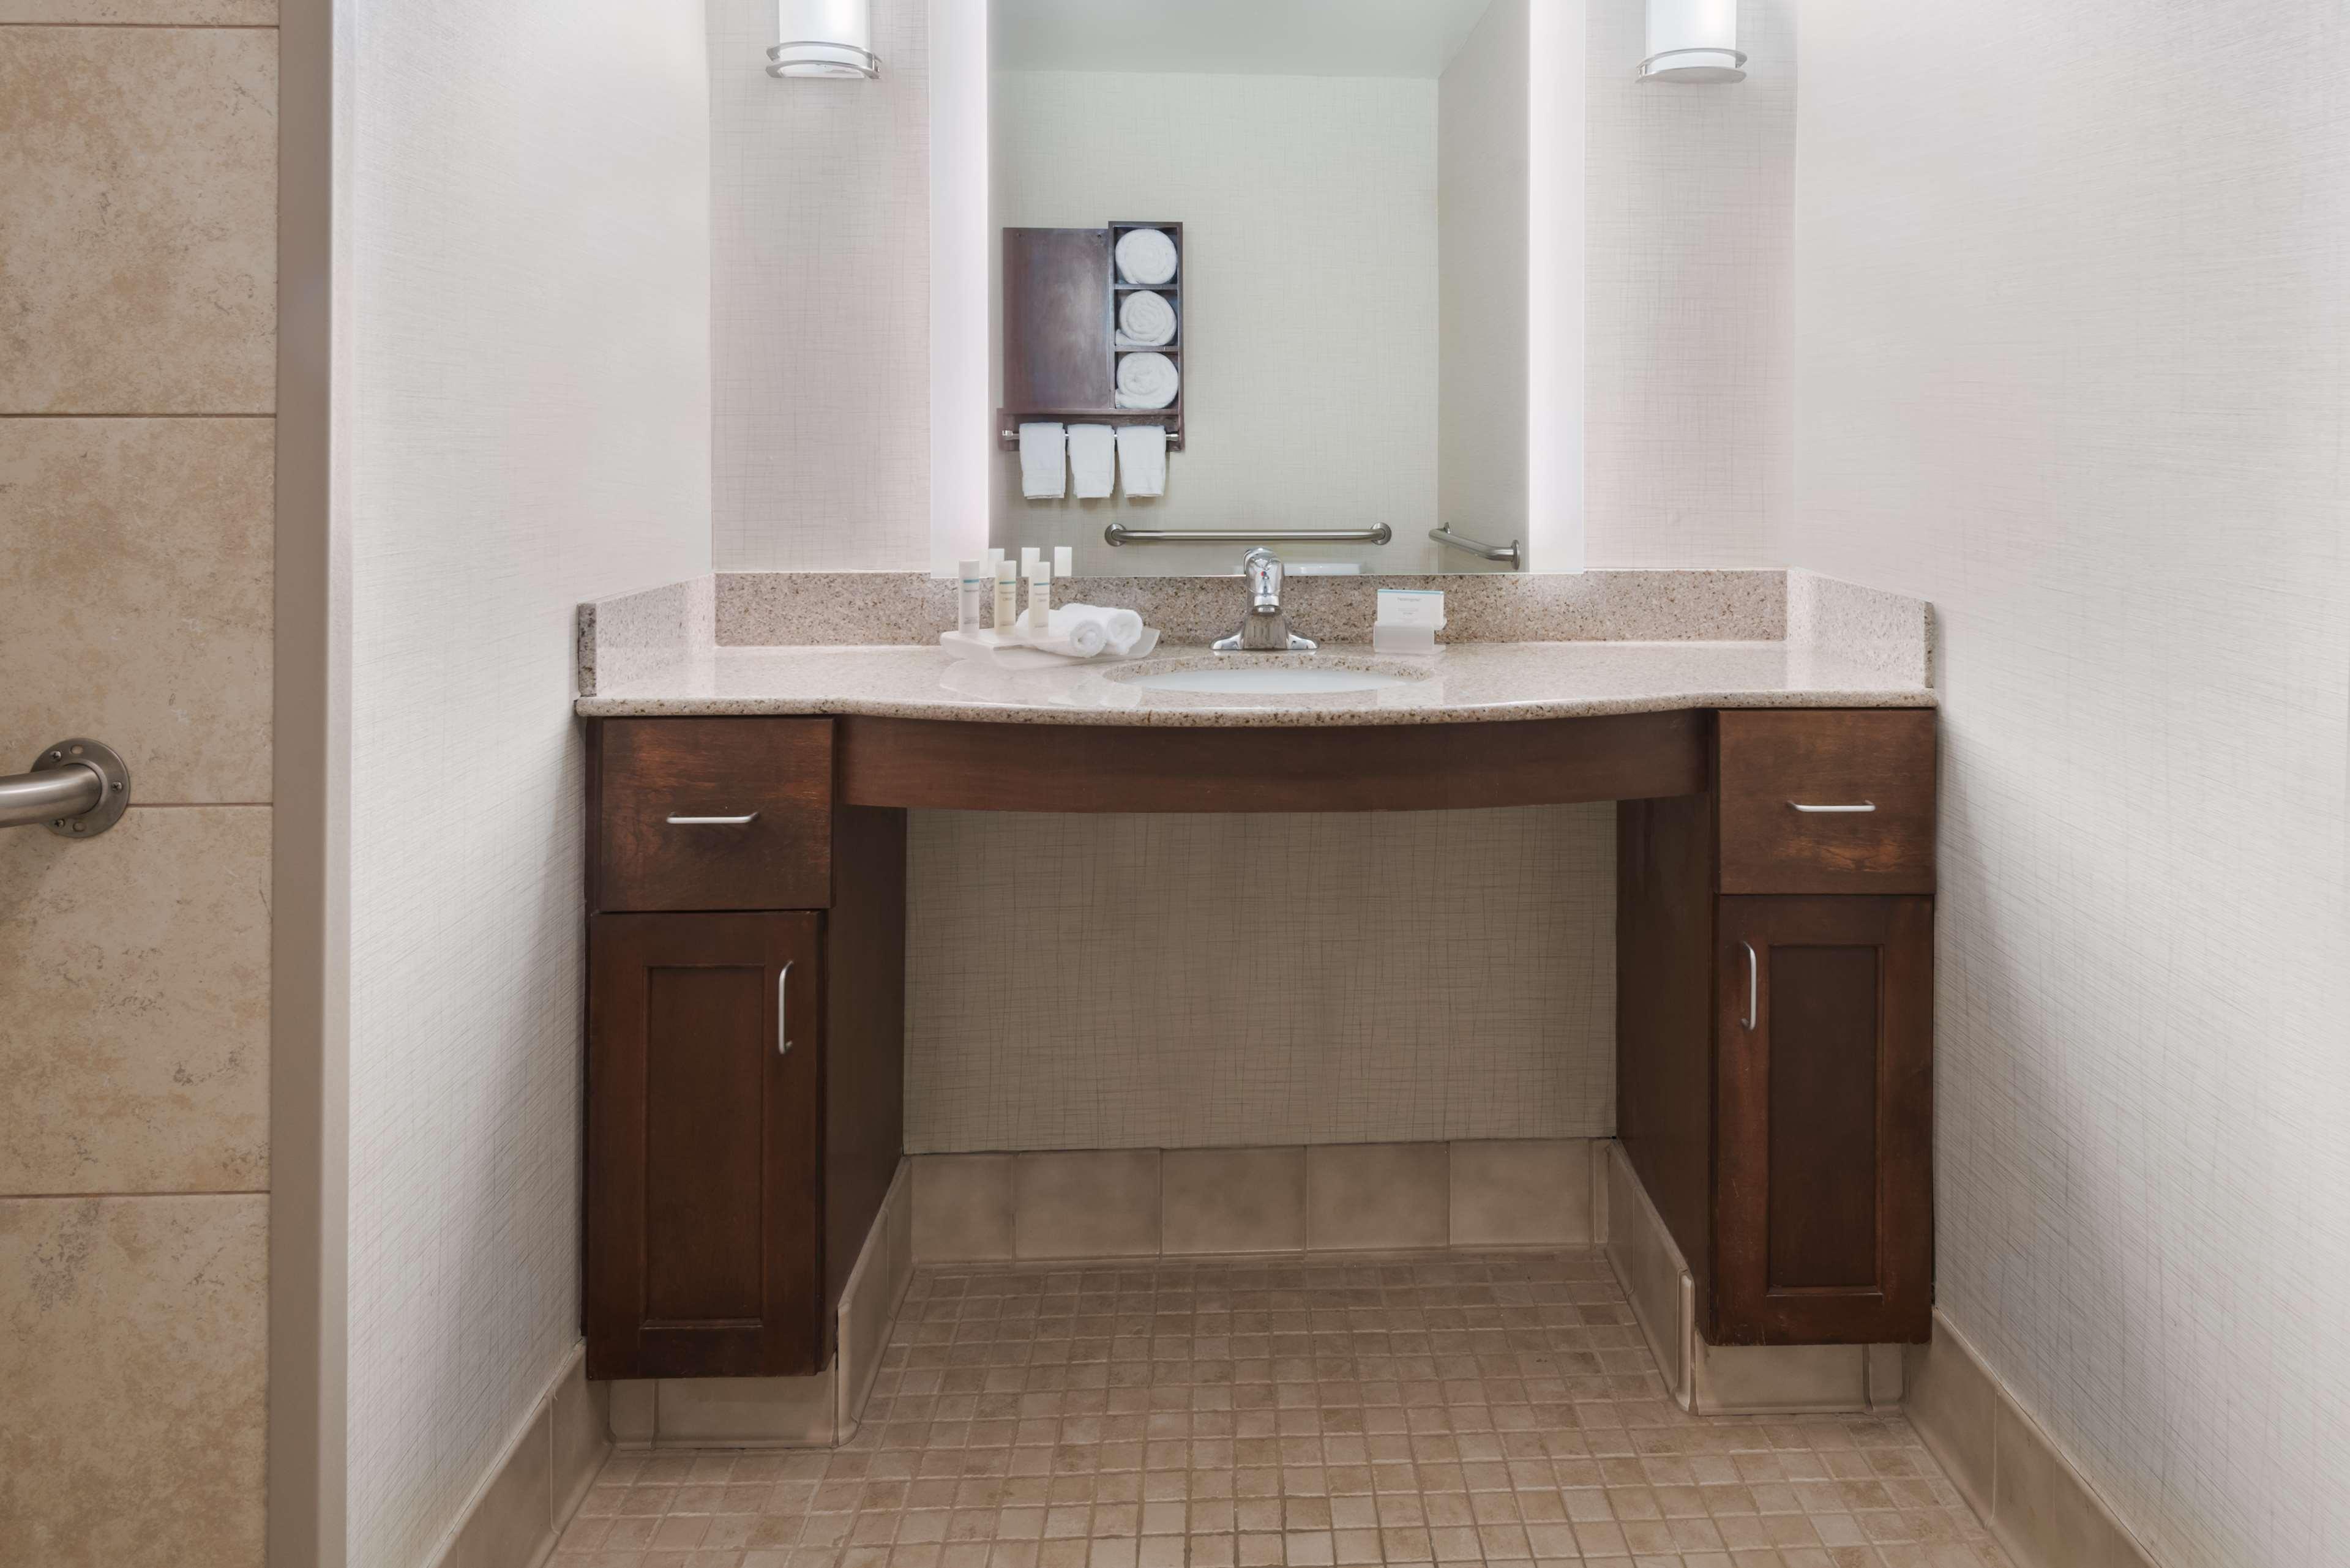 Homewood Suites by Hilton Holyoke-Springfield/North image 14